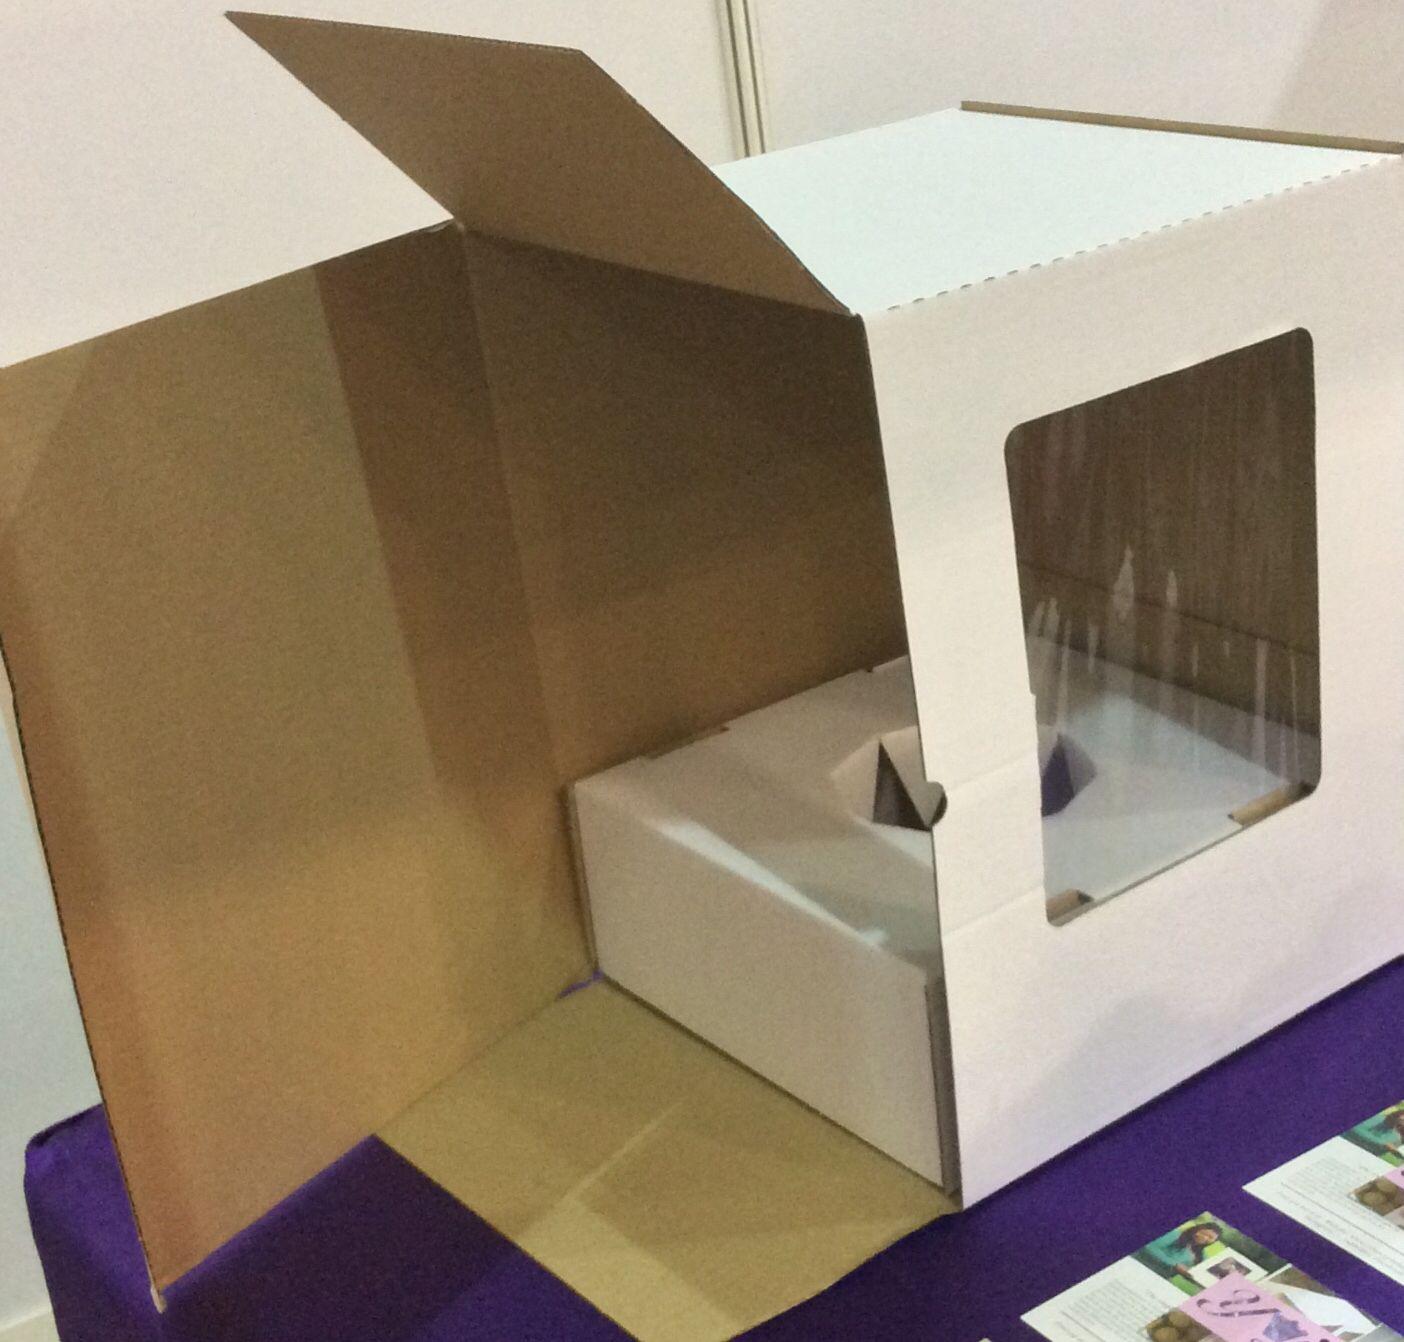 100 wedding cake box for transporting best 25 wedding cake display ideas on pinterest. Black Bedroom Furniture Sets. Home Design Ideas